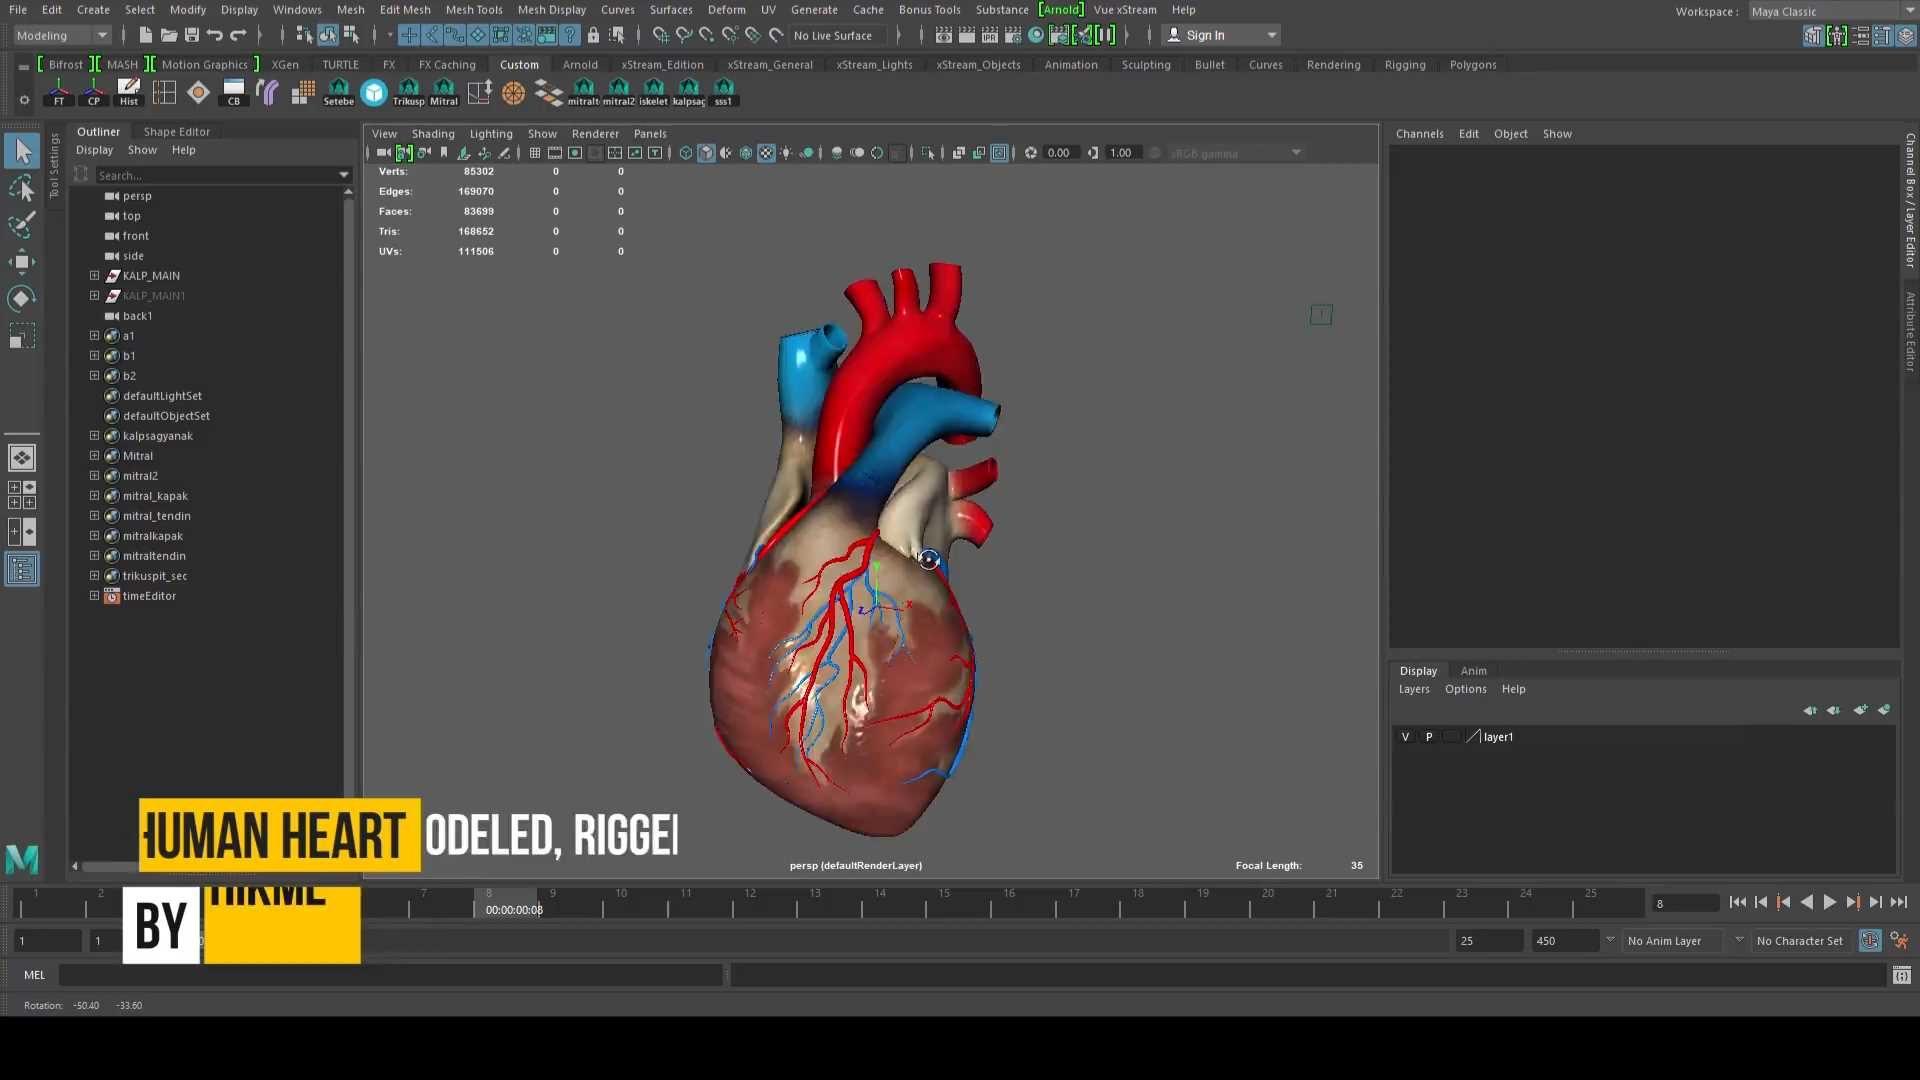 kalb4 1920x1080 - İnsan kalbi medikal animasyon projesi